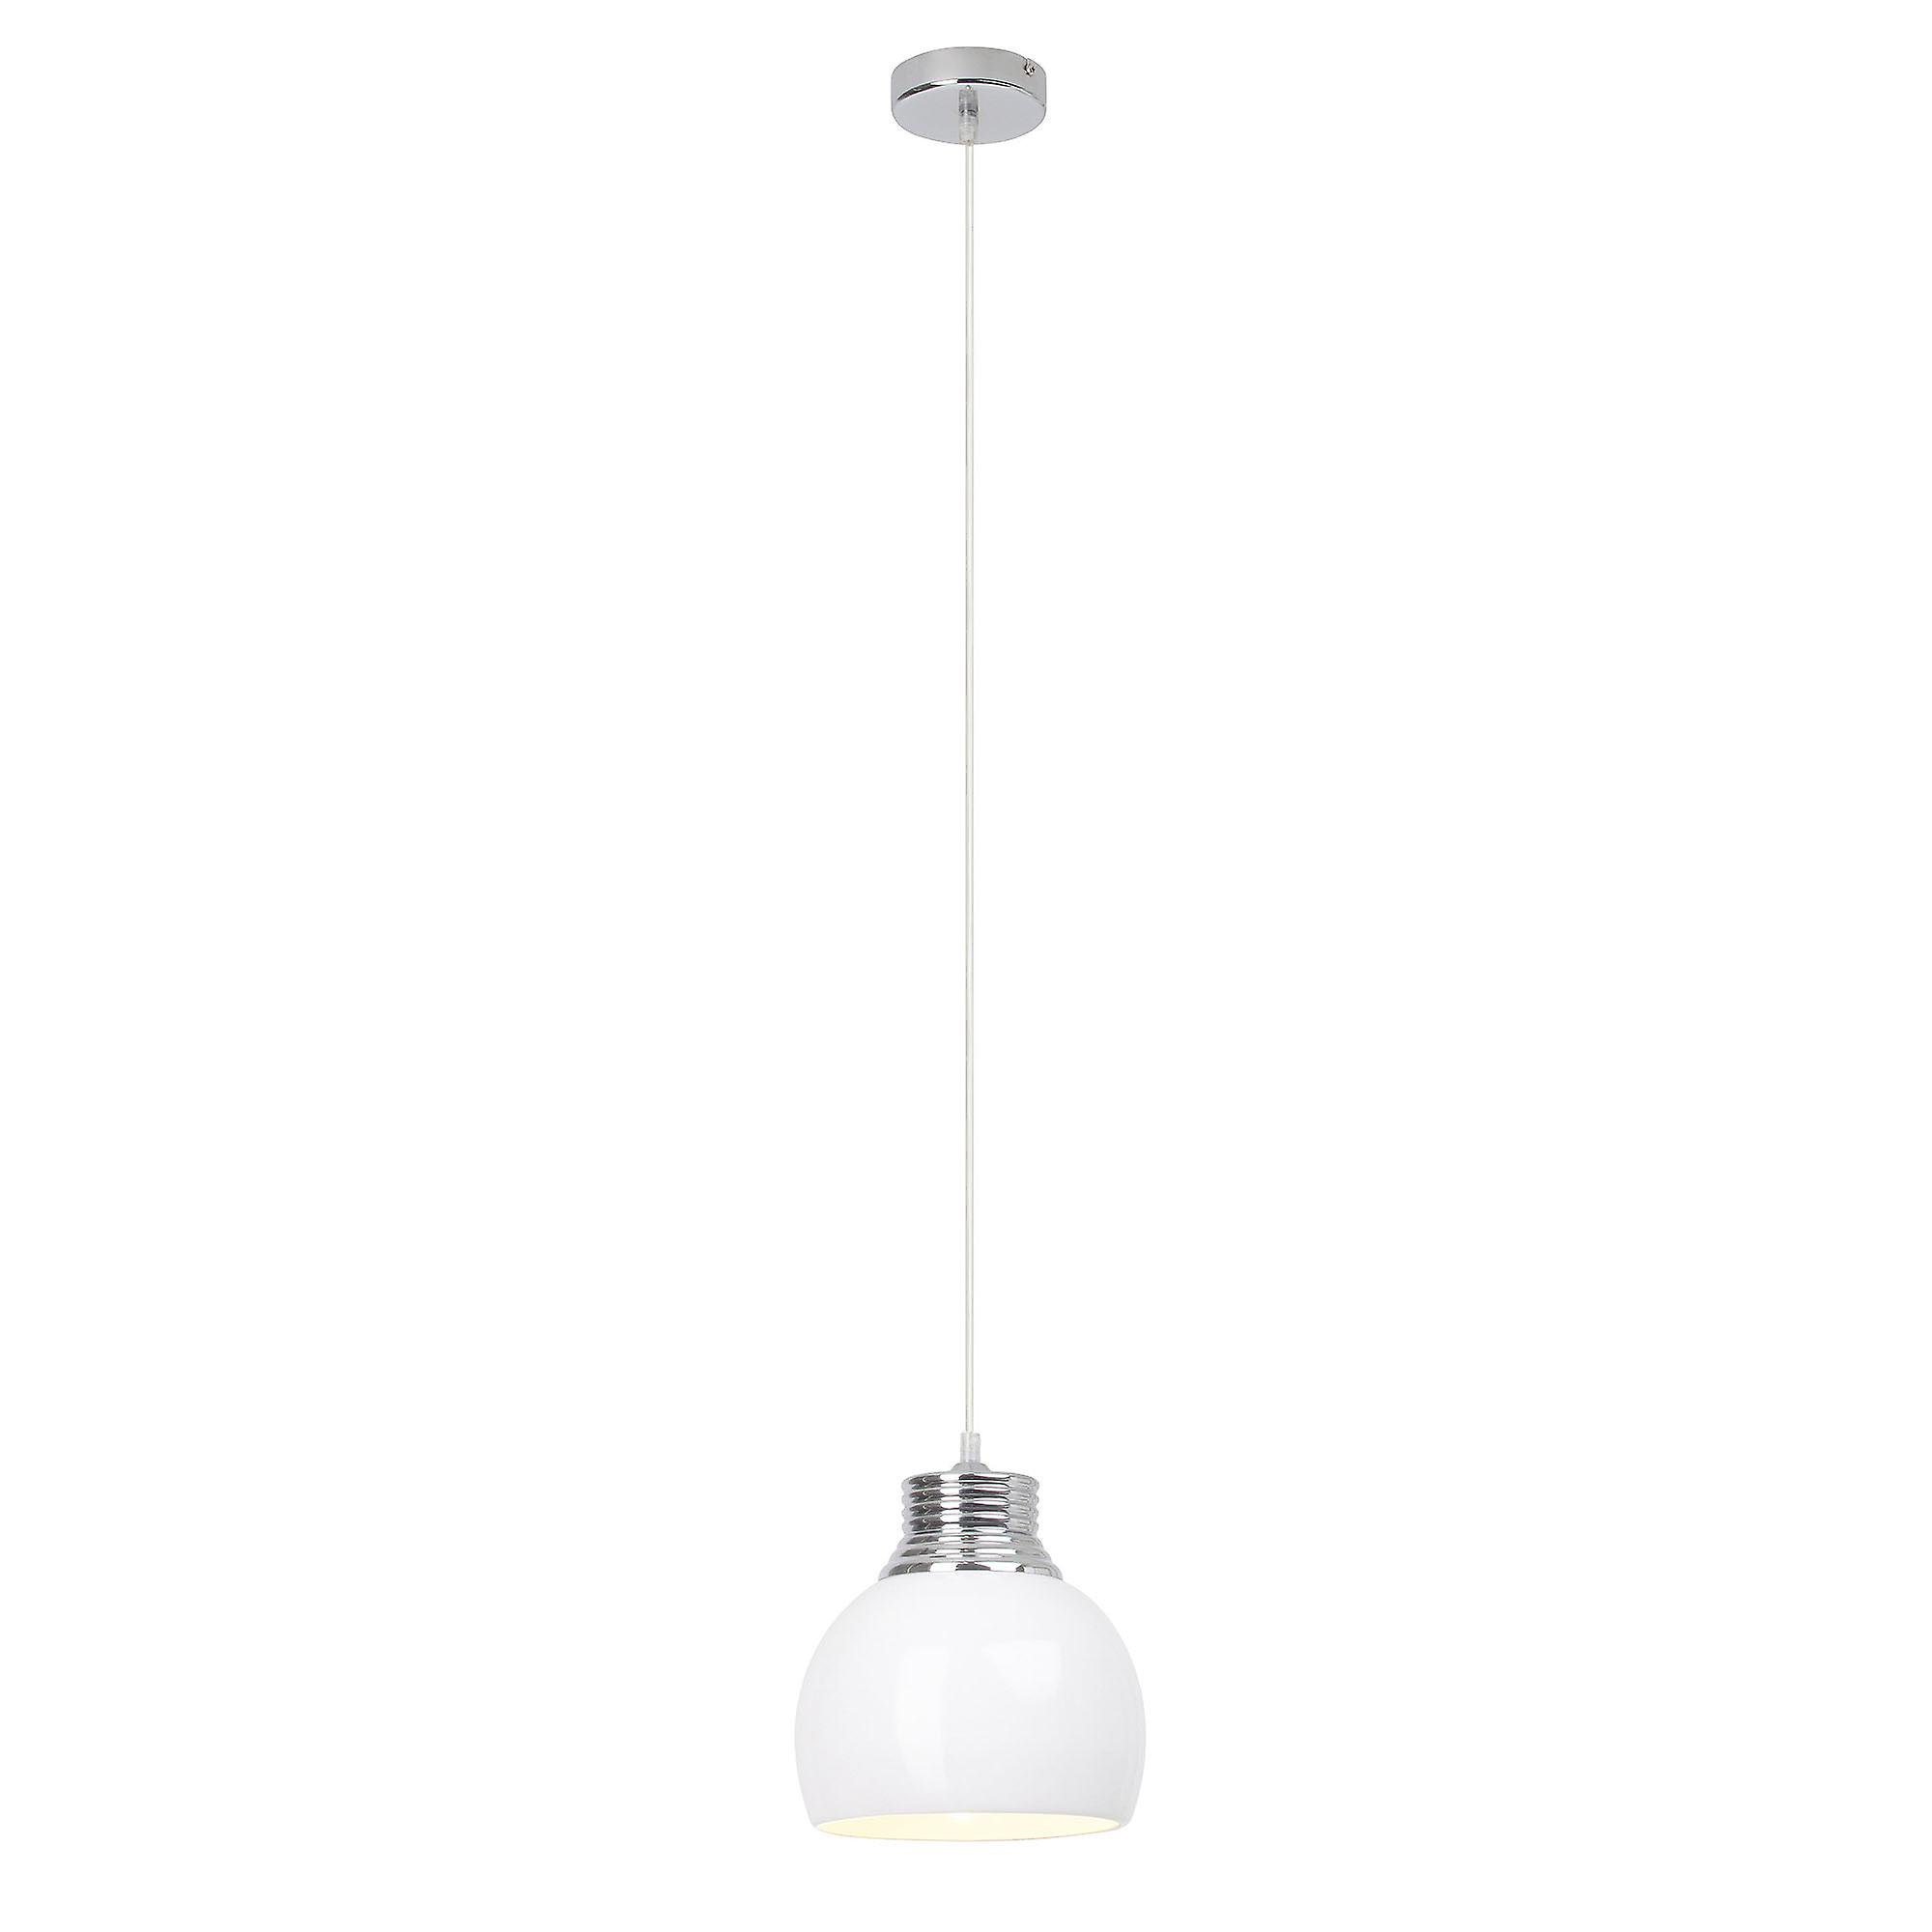 Brilliant Lampe Ina Pendelleuchte 20cm weiß/chrom